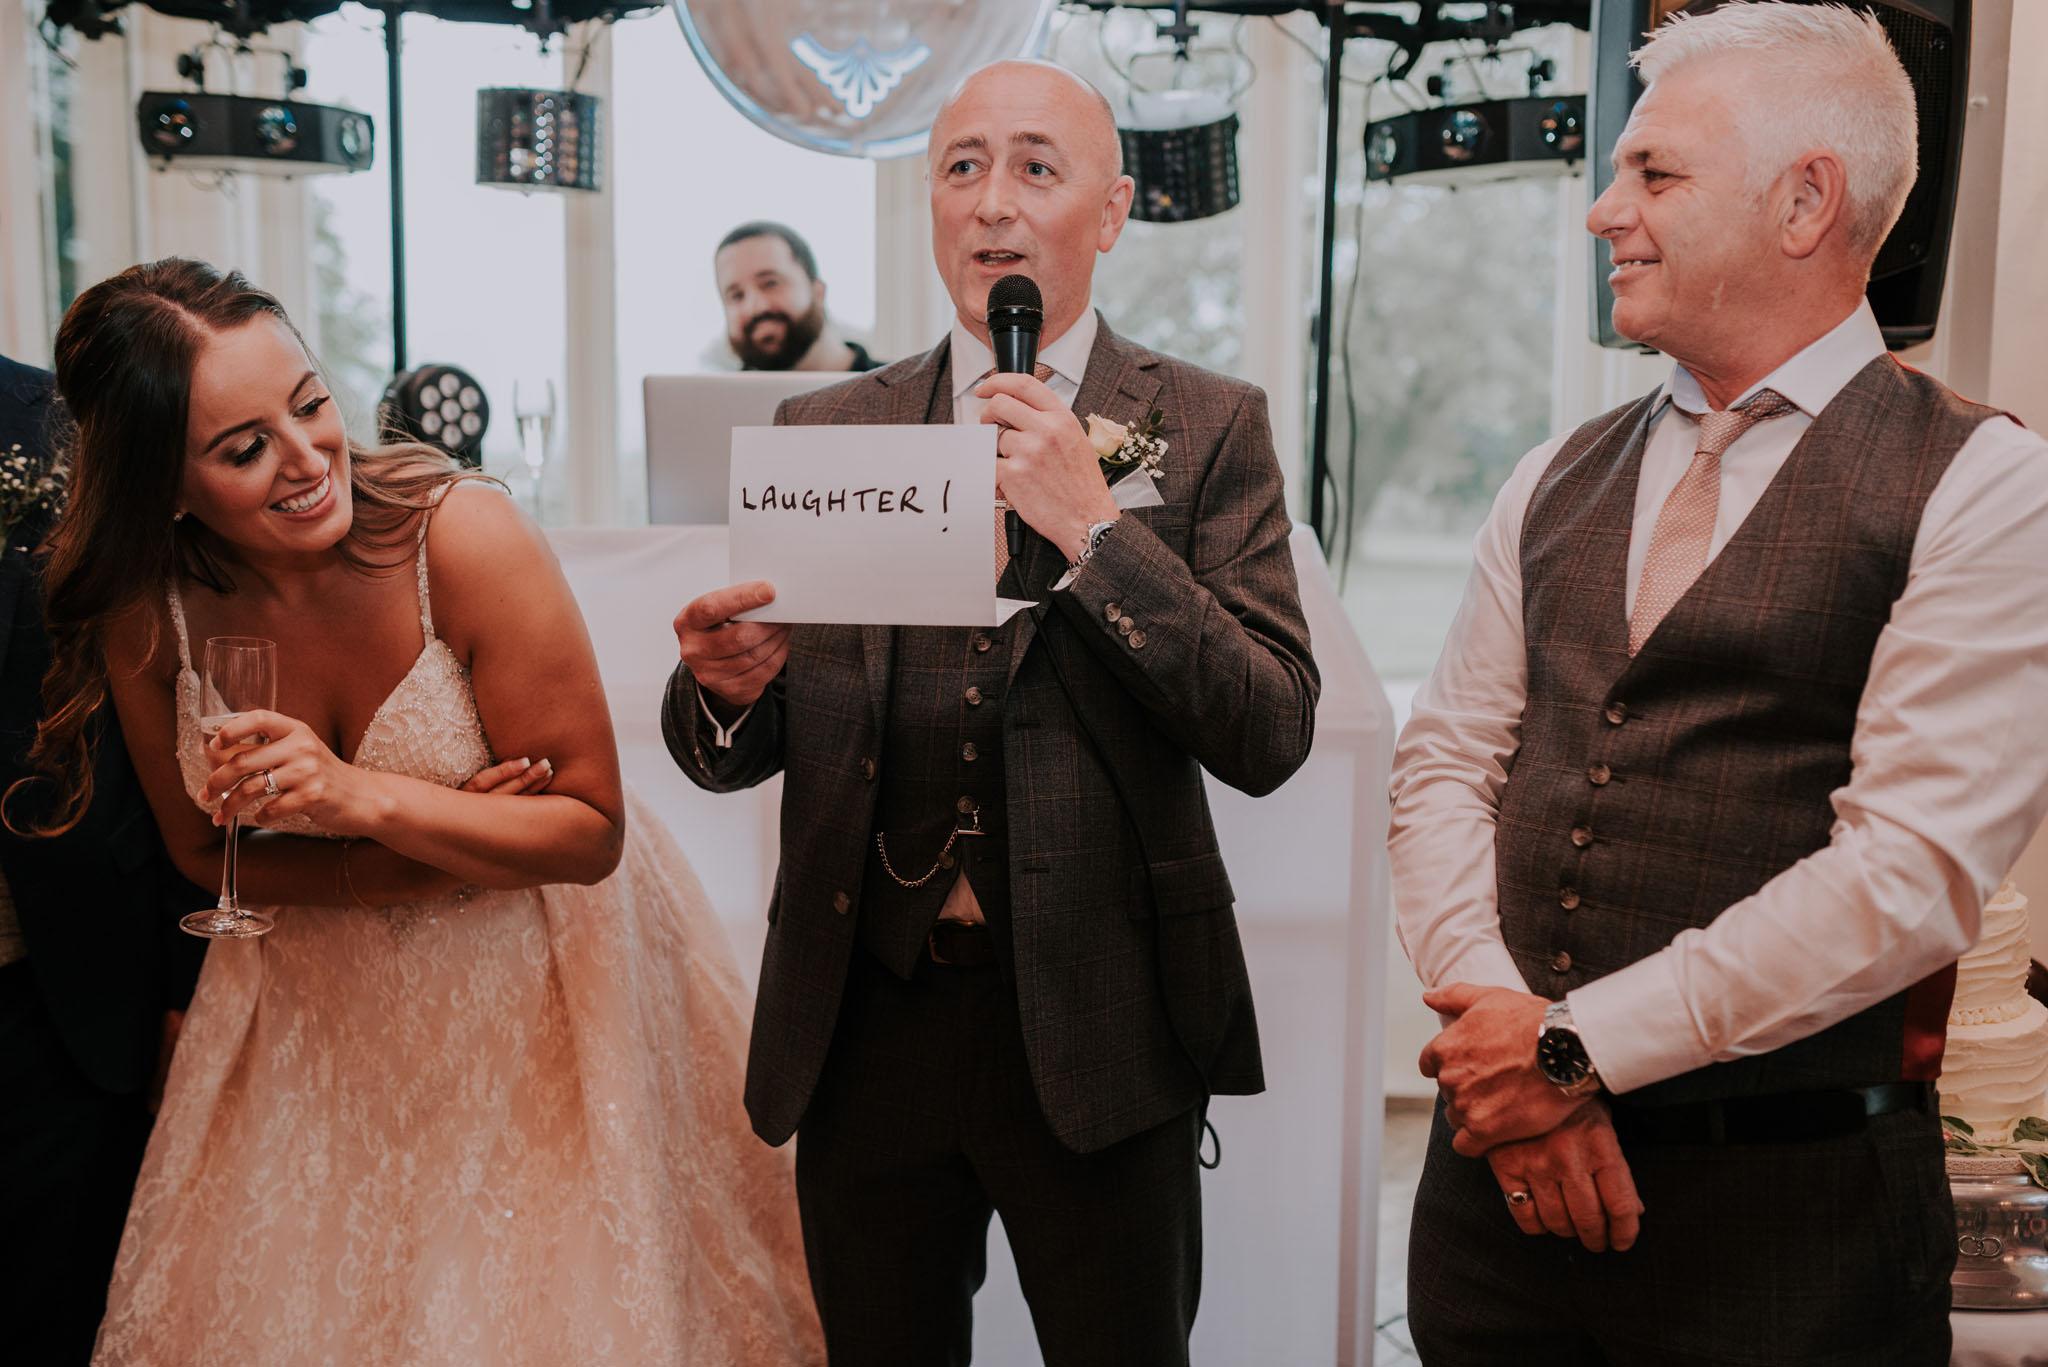 wedding-photographer-glewstone-court-hereford-scott-stockwell-photography412.jpg